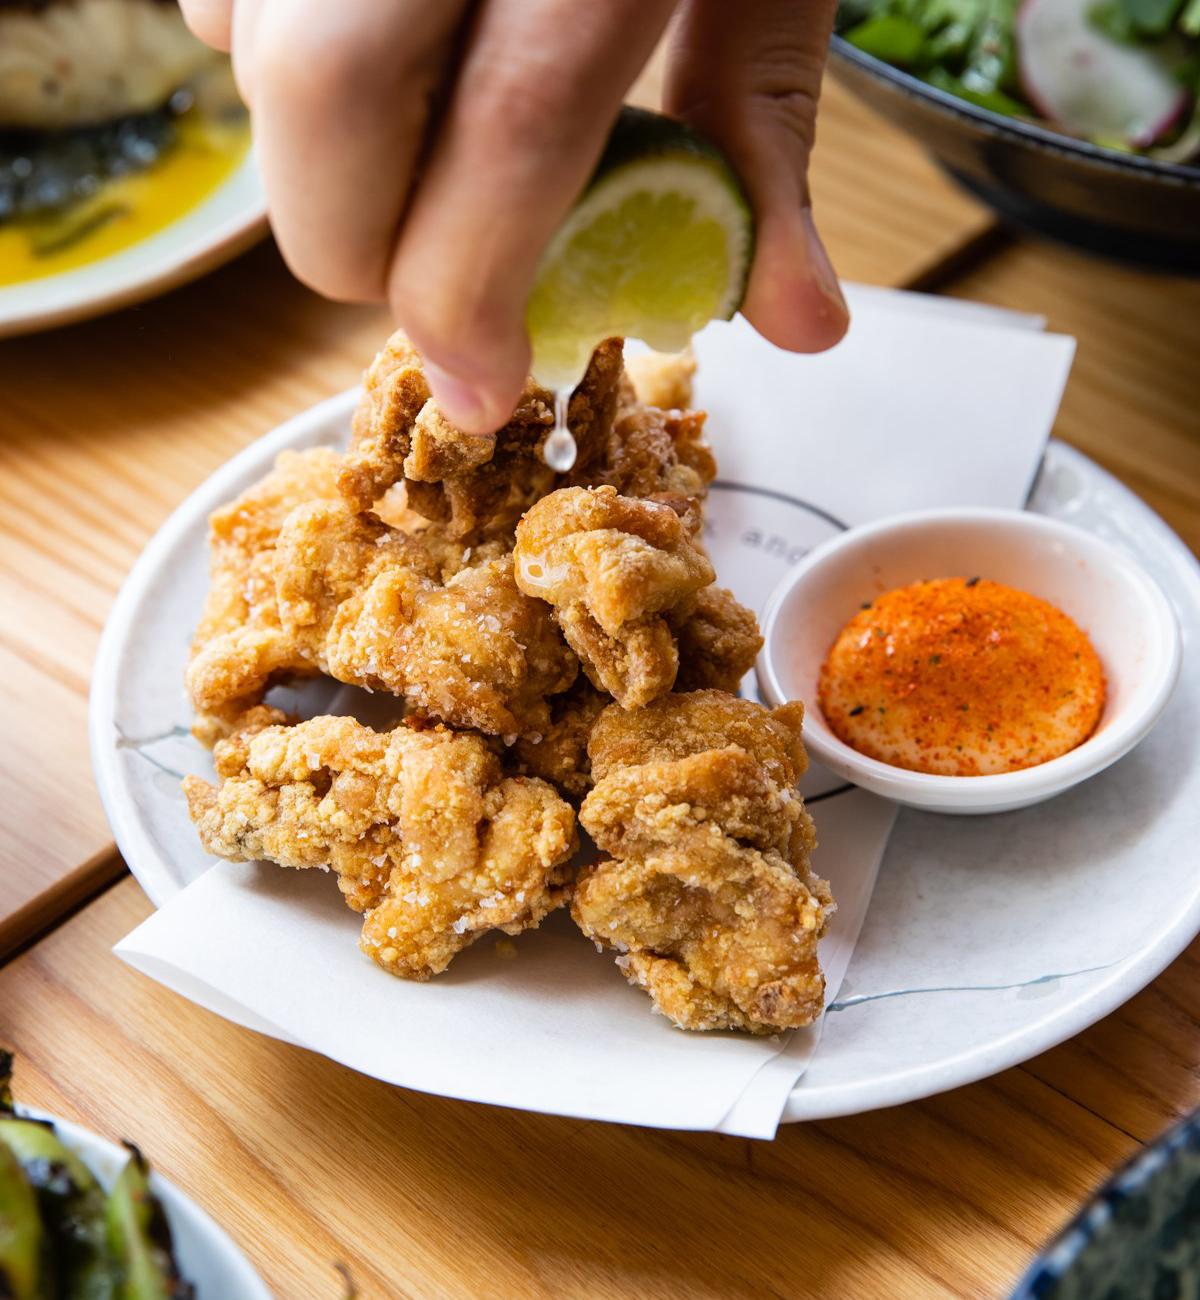 a plate of karaage chicken